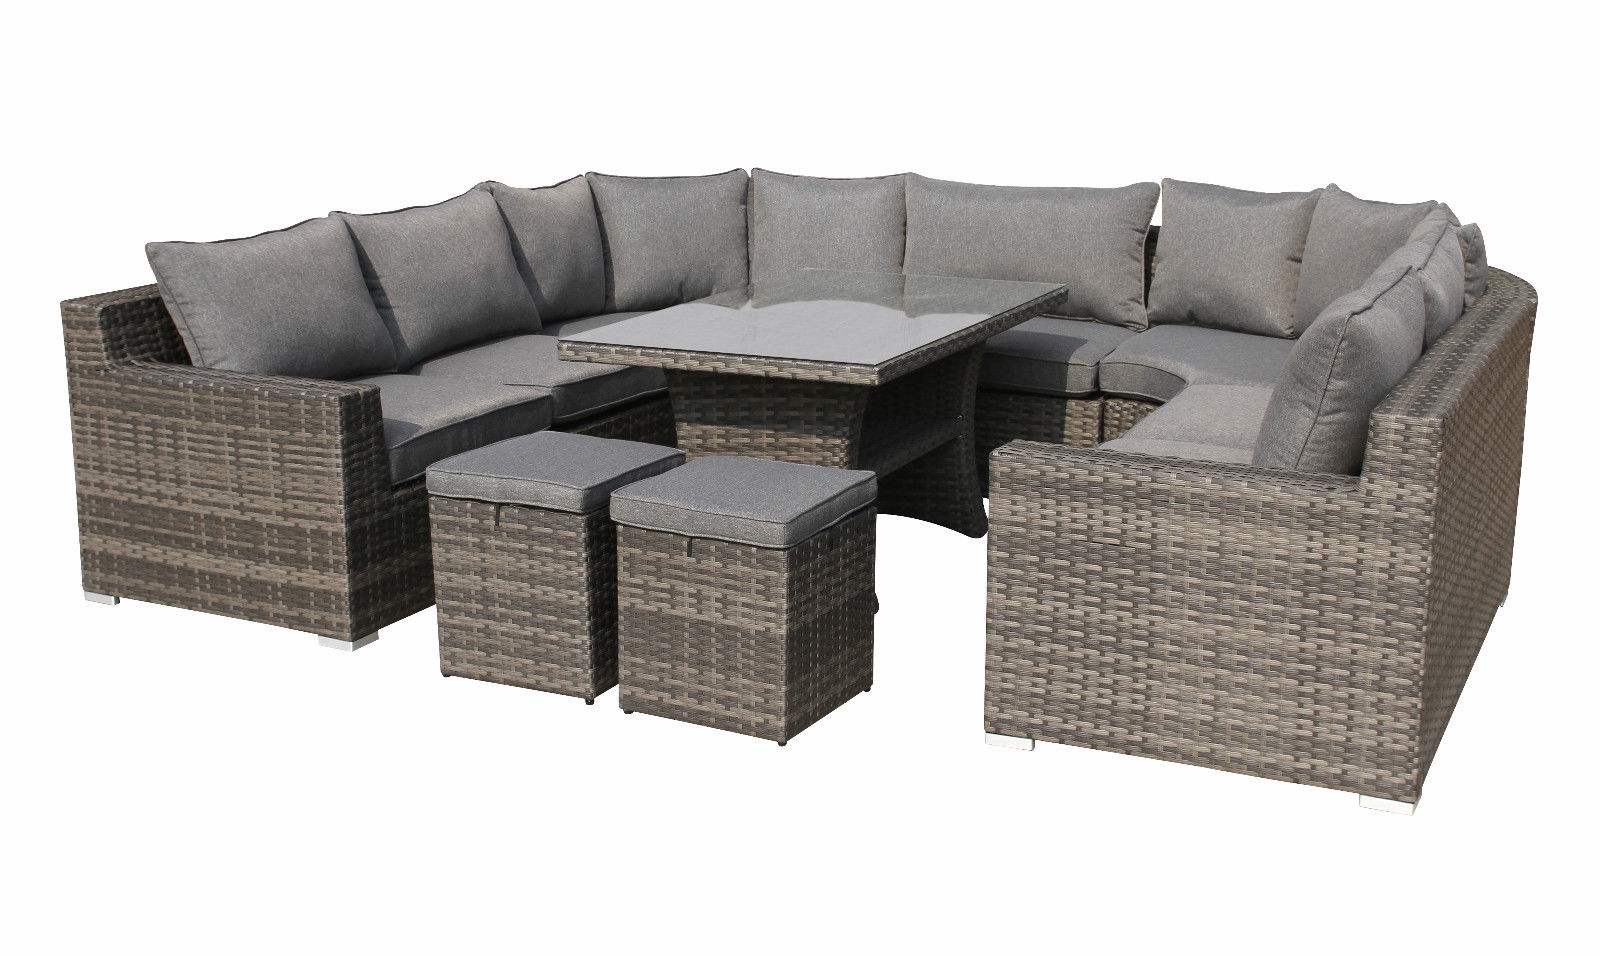 EPIC XXL Lounge Polyrattan Garten U-Lounge Set grau | Lounge-Möbel ...